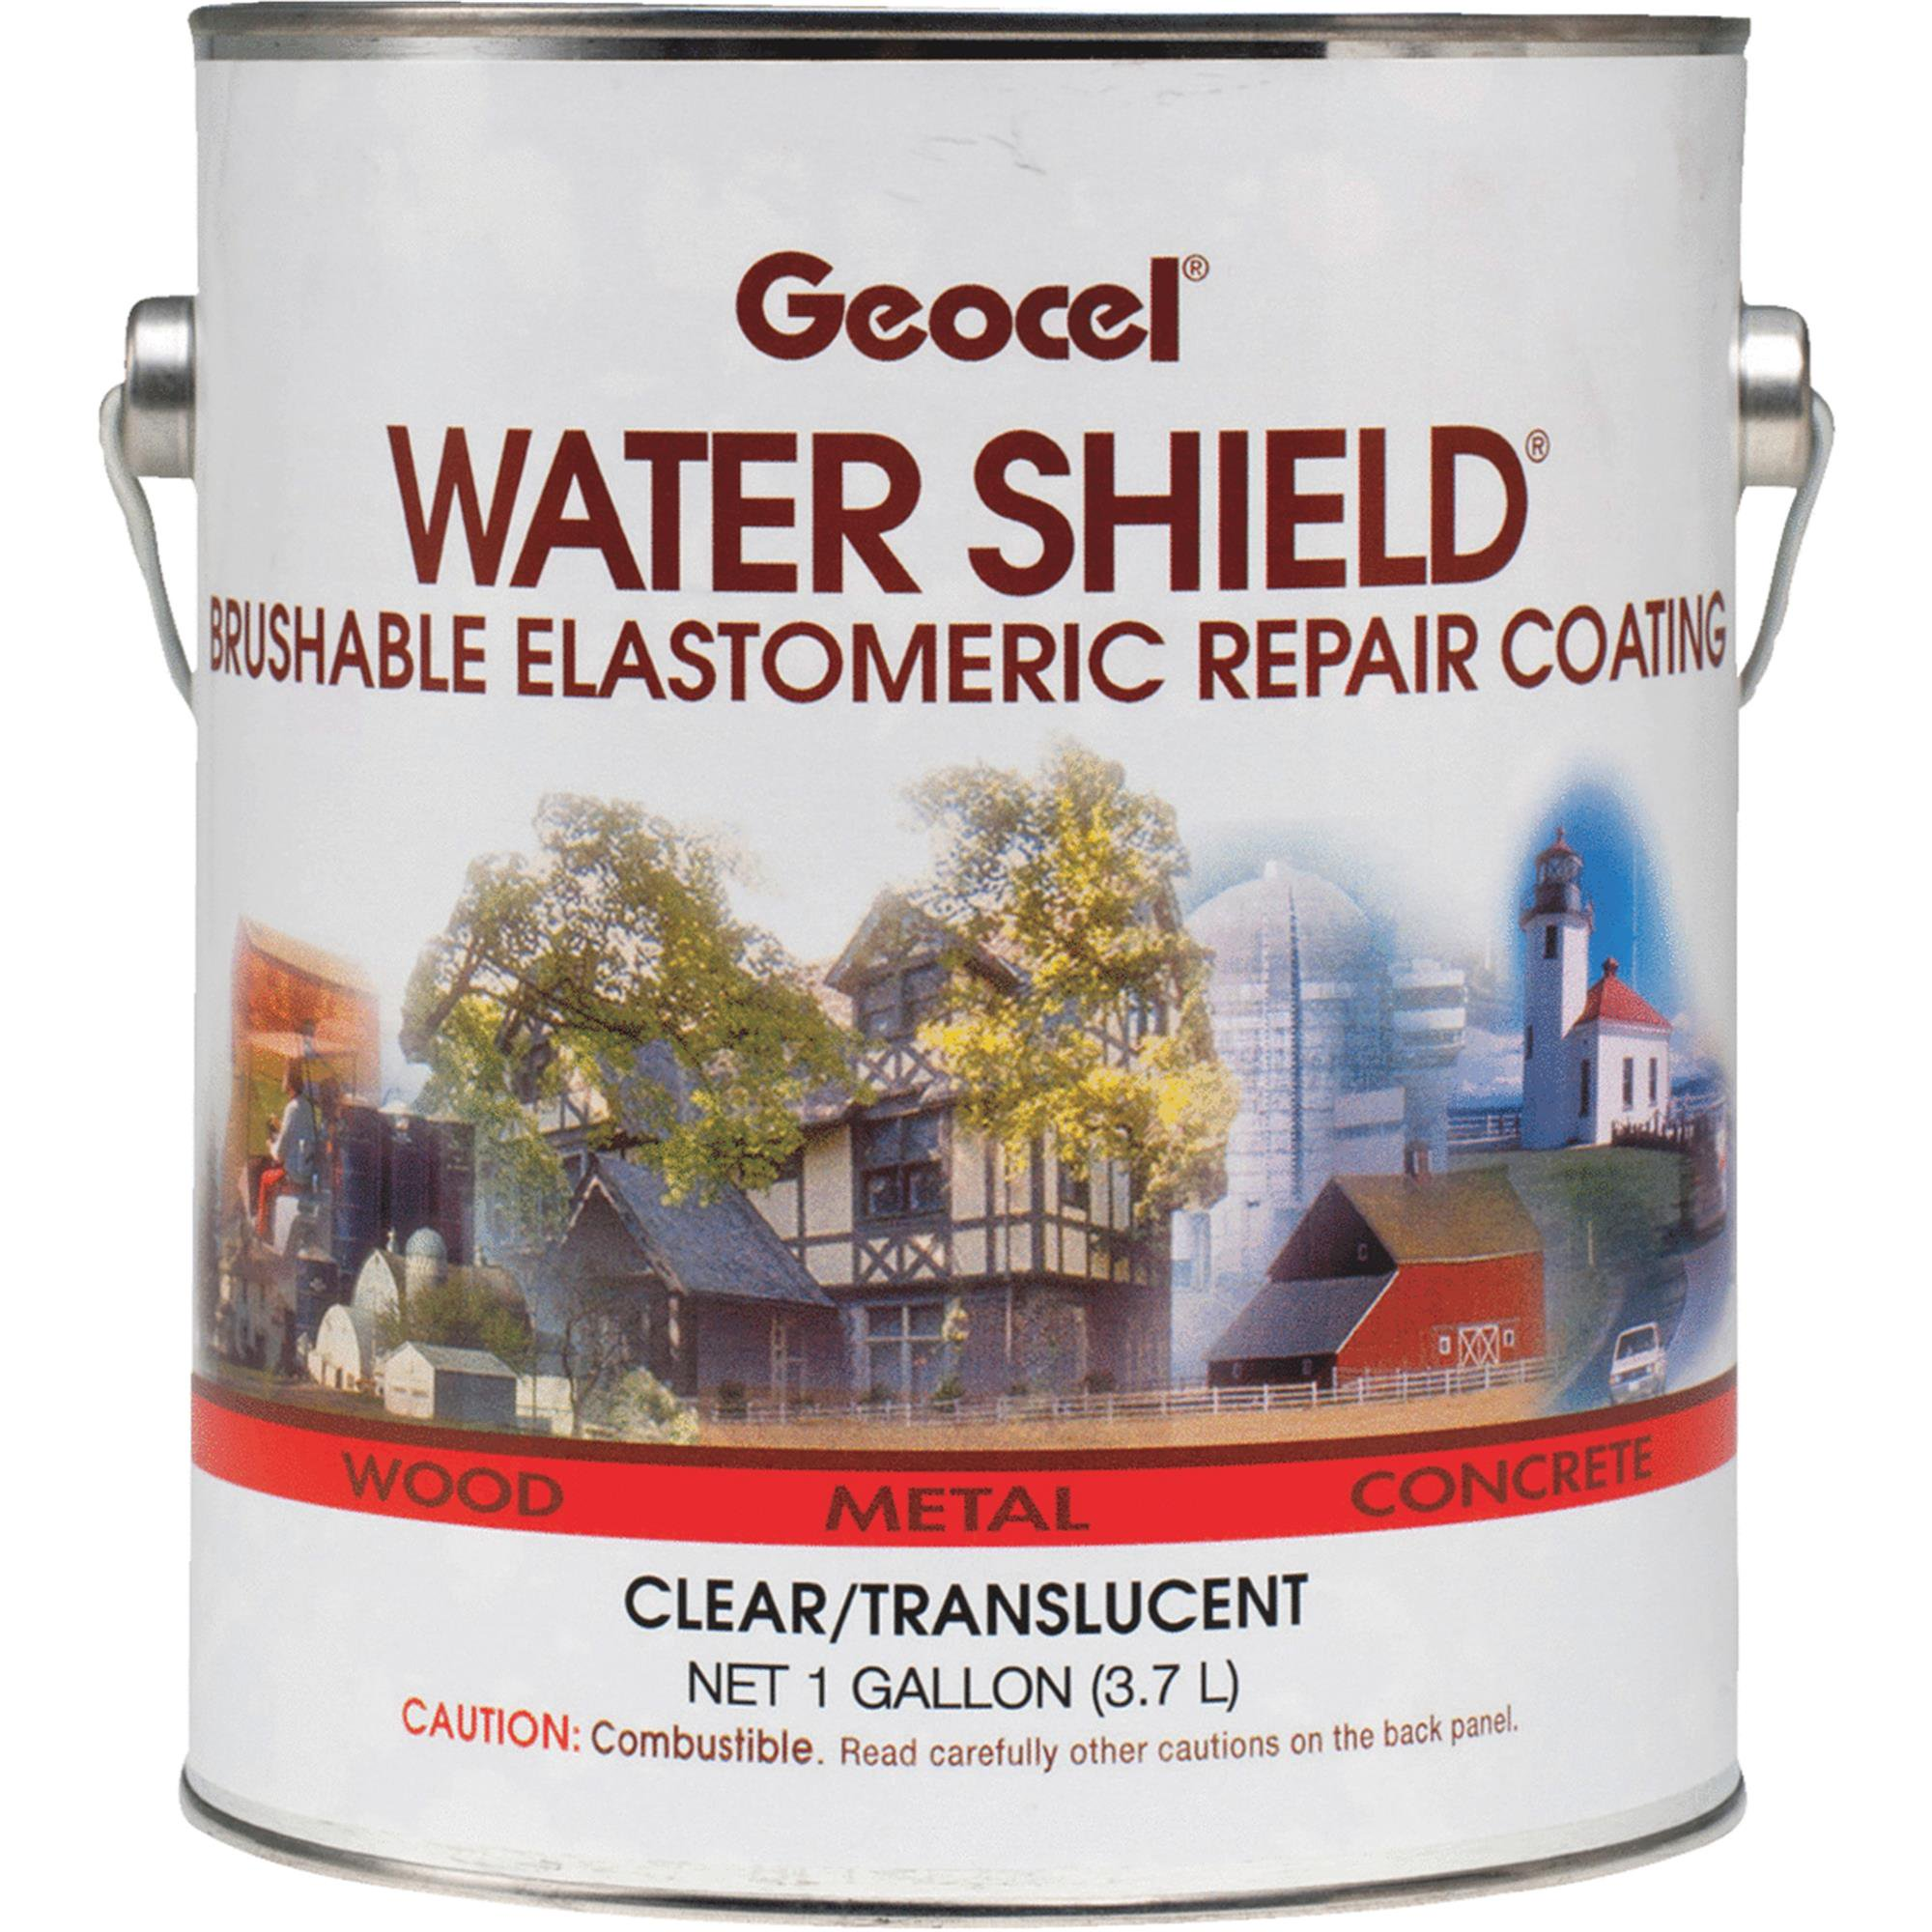 Geocel Water Shield Repair Coating